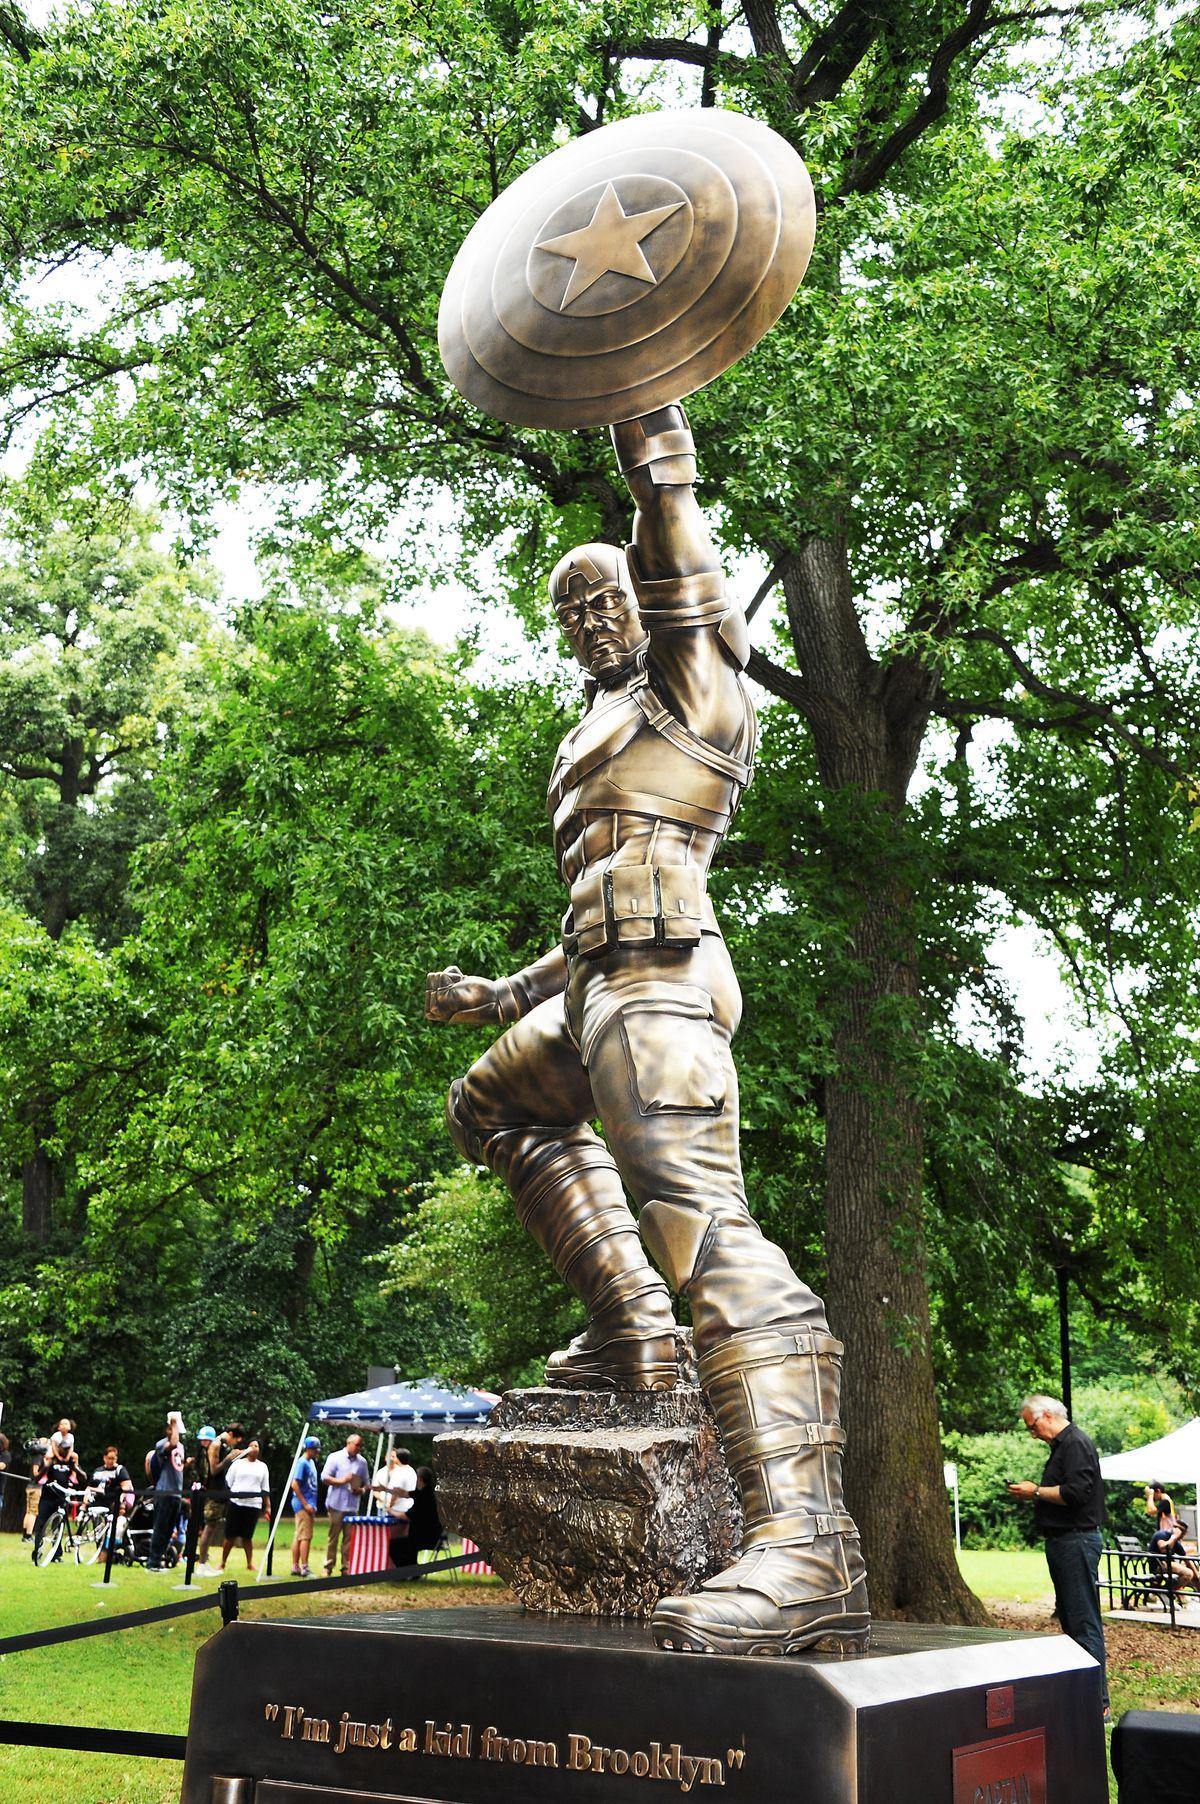 Captain America Statue Dedication Ceremony